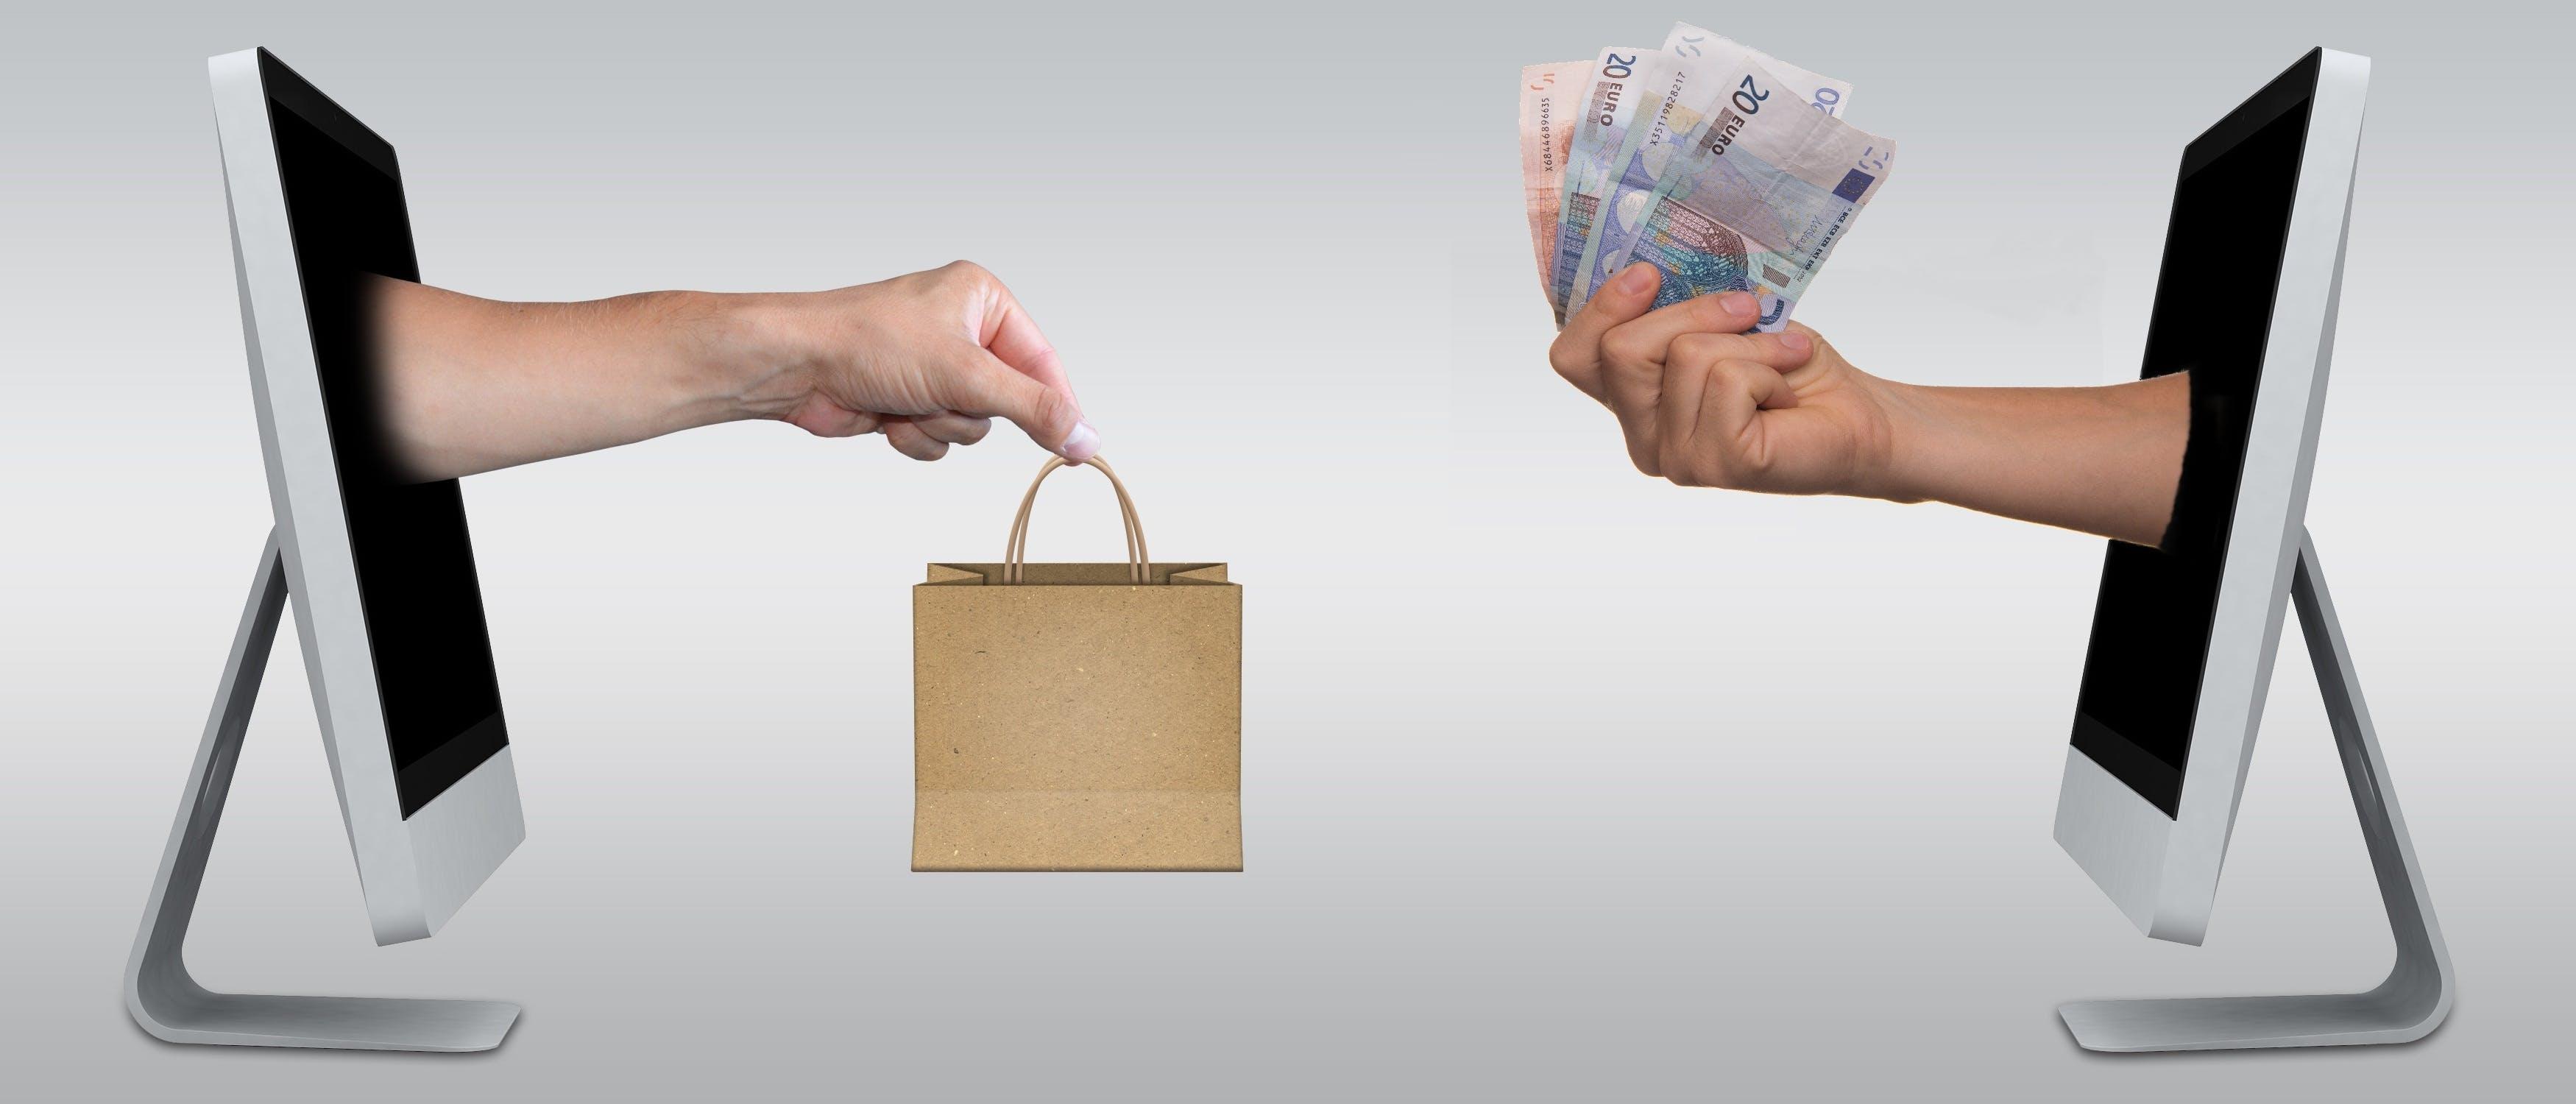 Titelbild-Konsumgüter-Einzelhandel-Online-Shopping-digital-3640321-pixabay-Tumisu